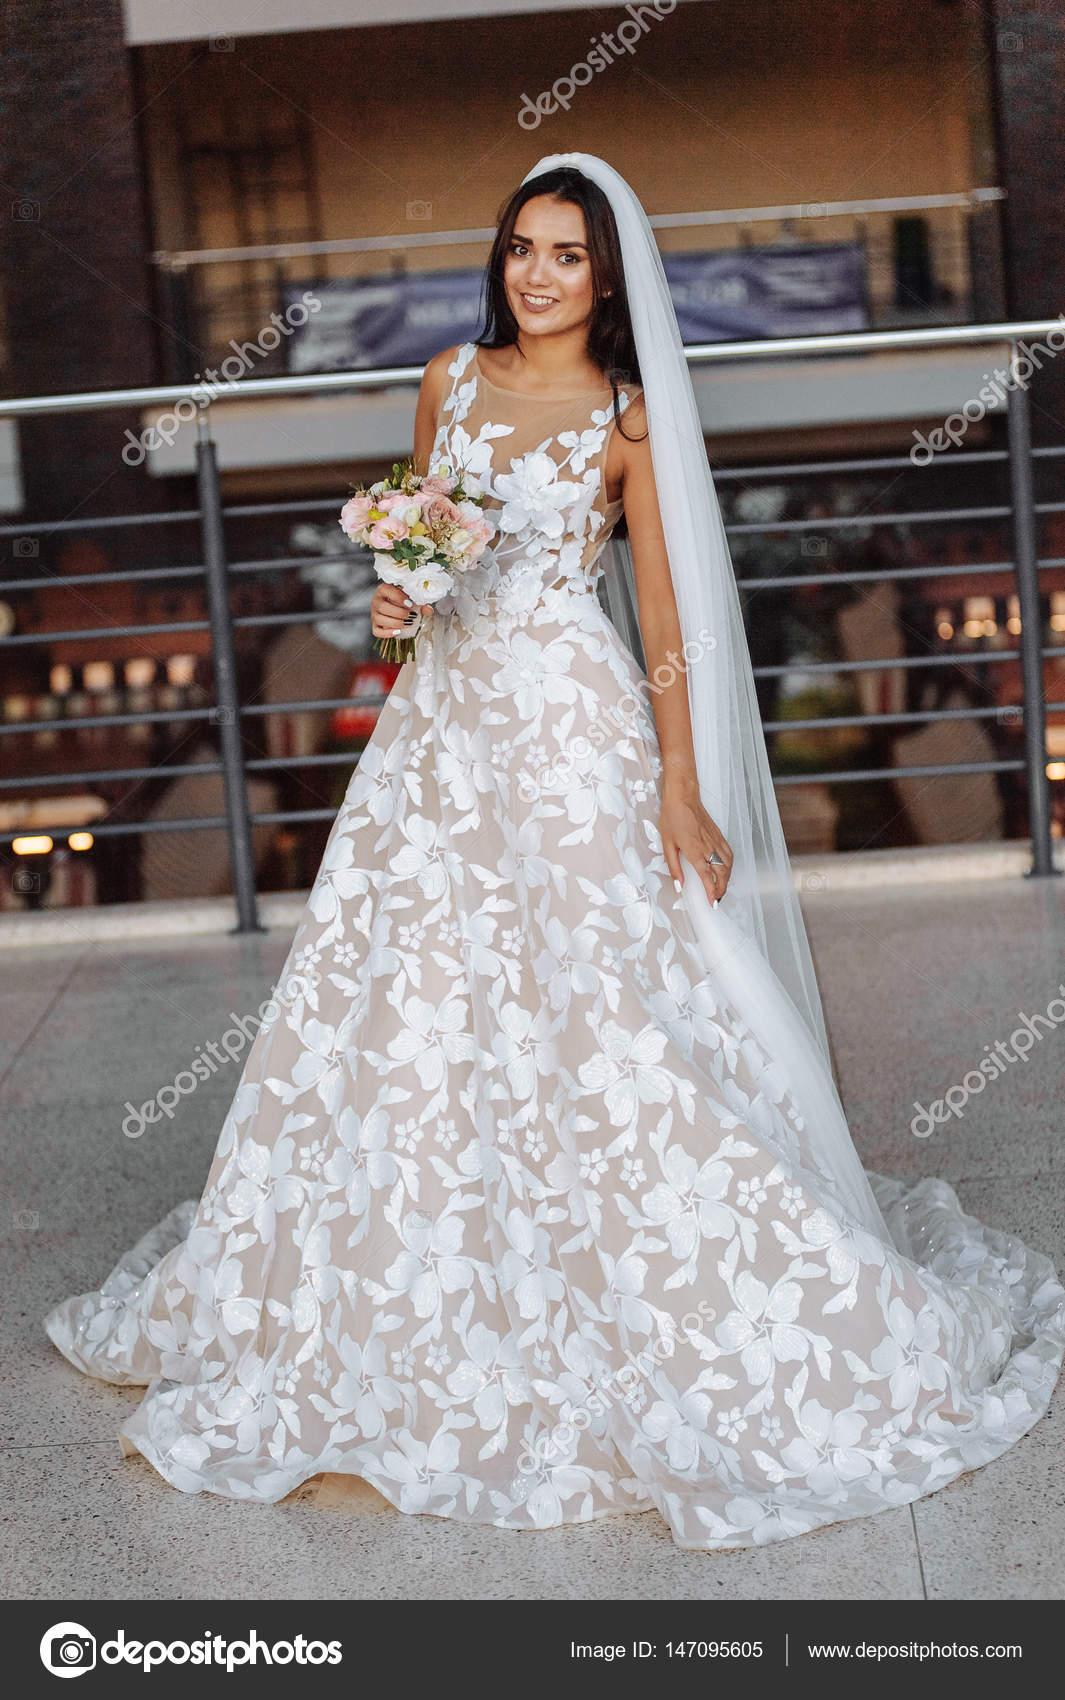 Vestido branco longo com flores